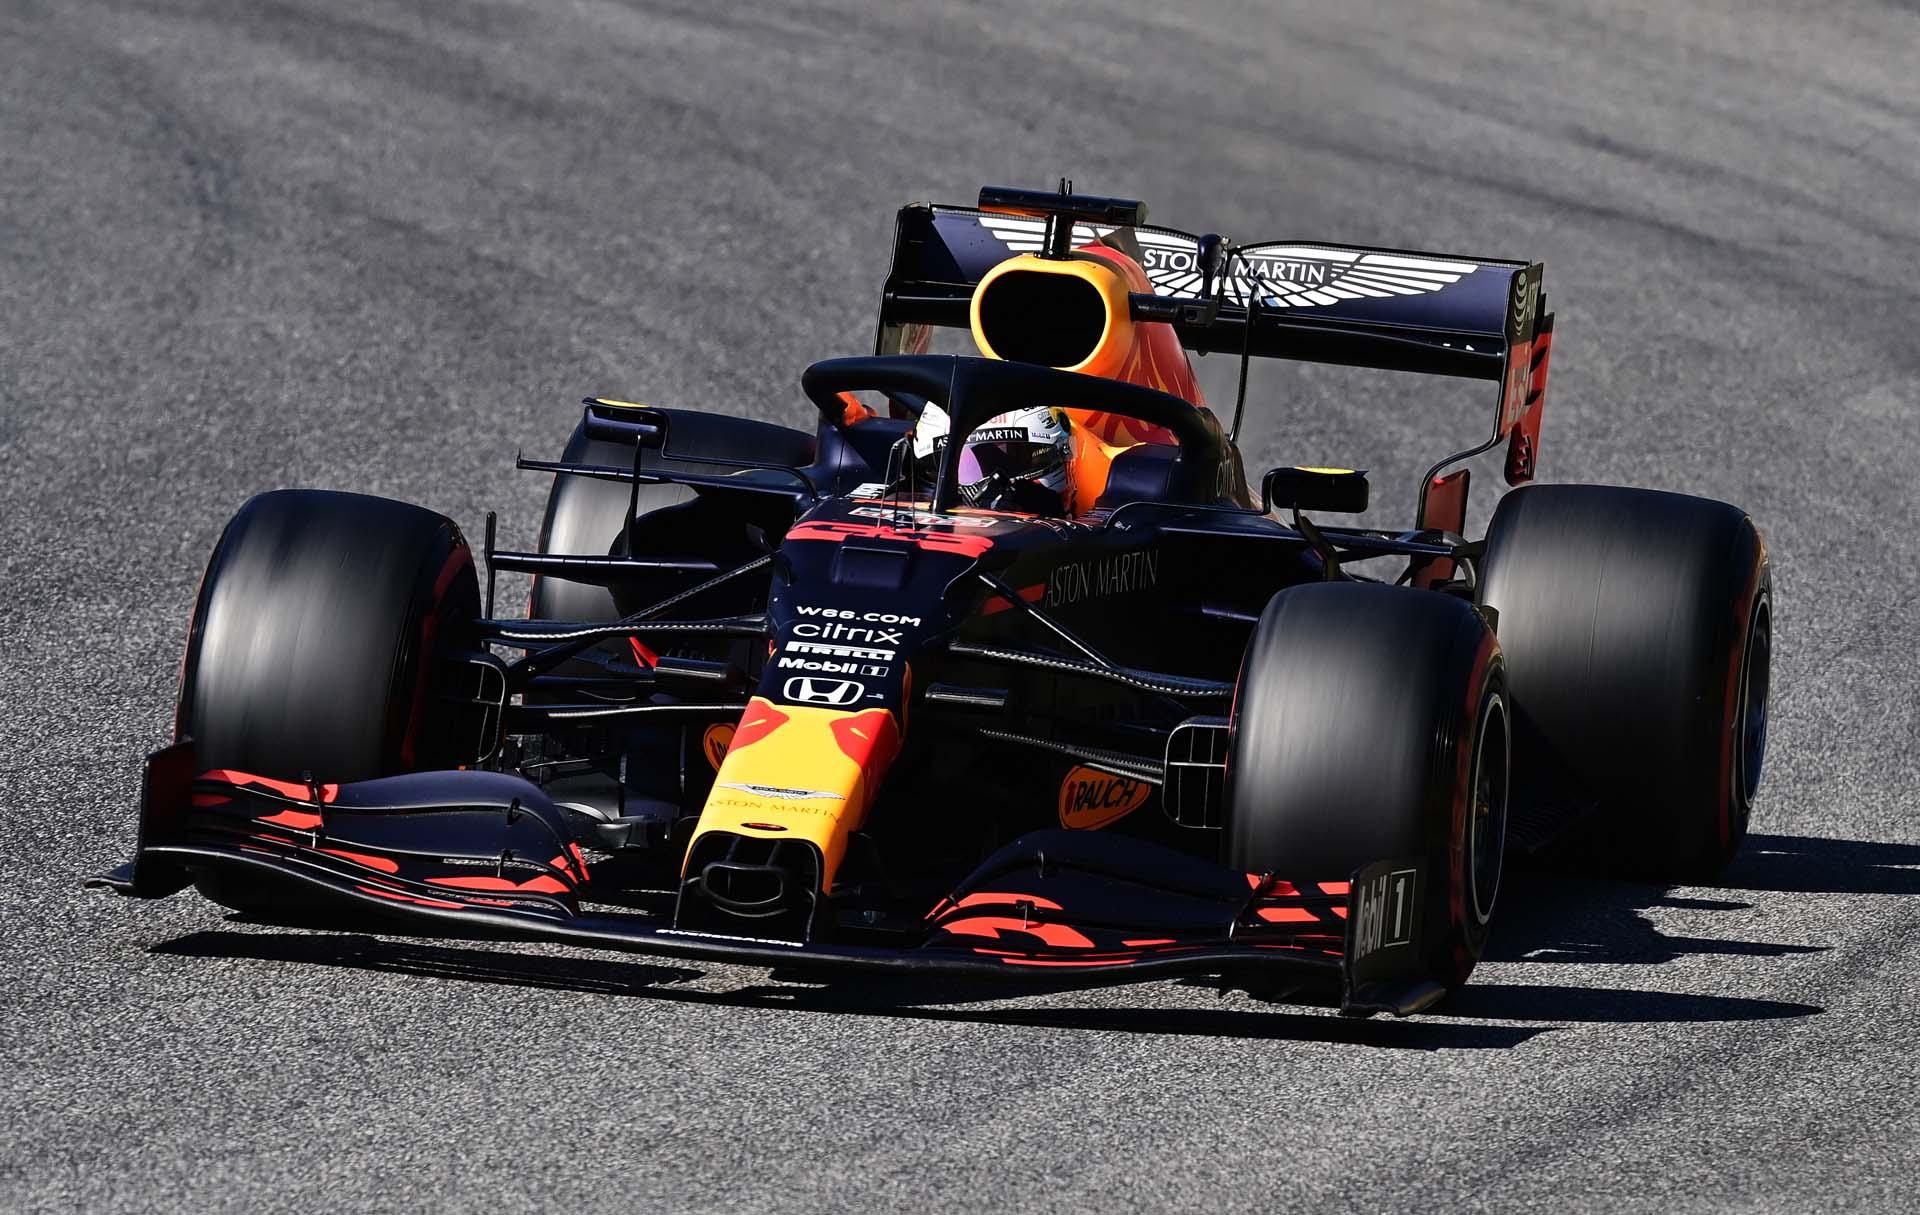 F1 Grand Prix of Tuscany - Qualifying